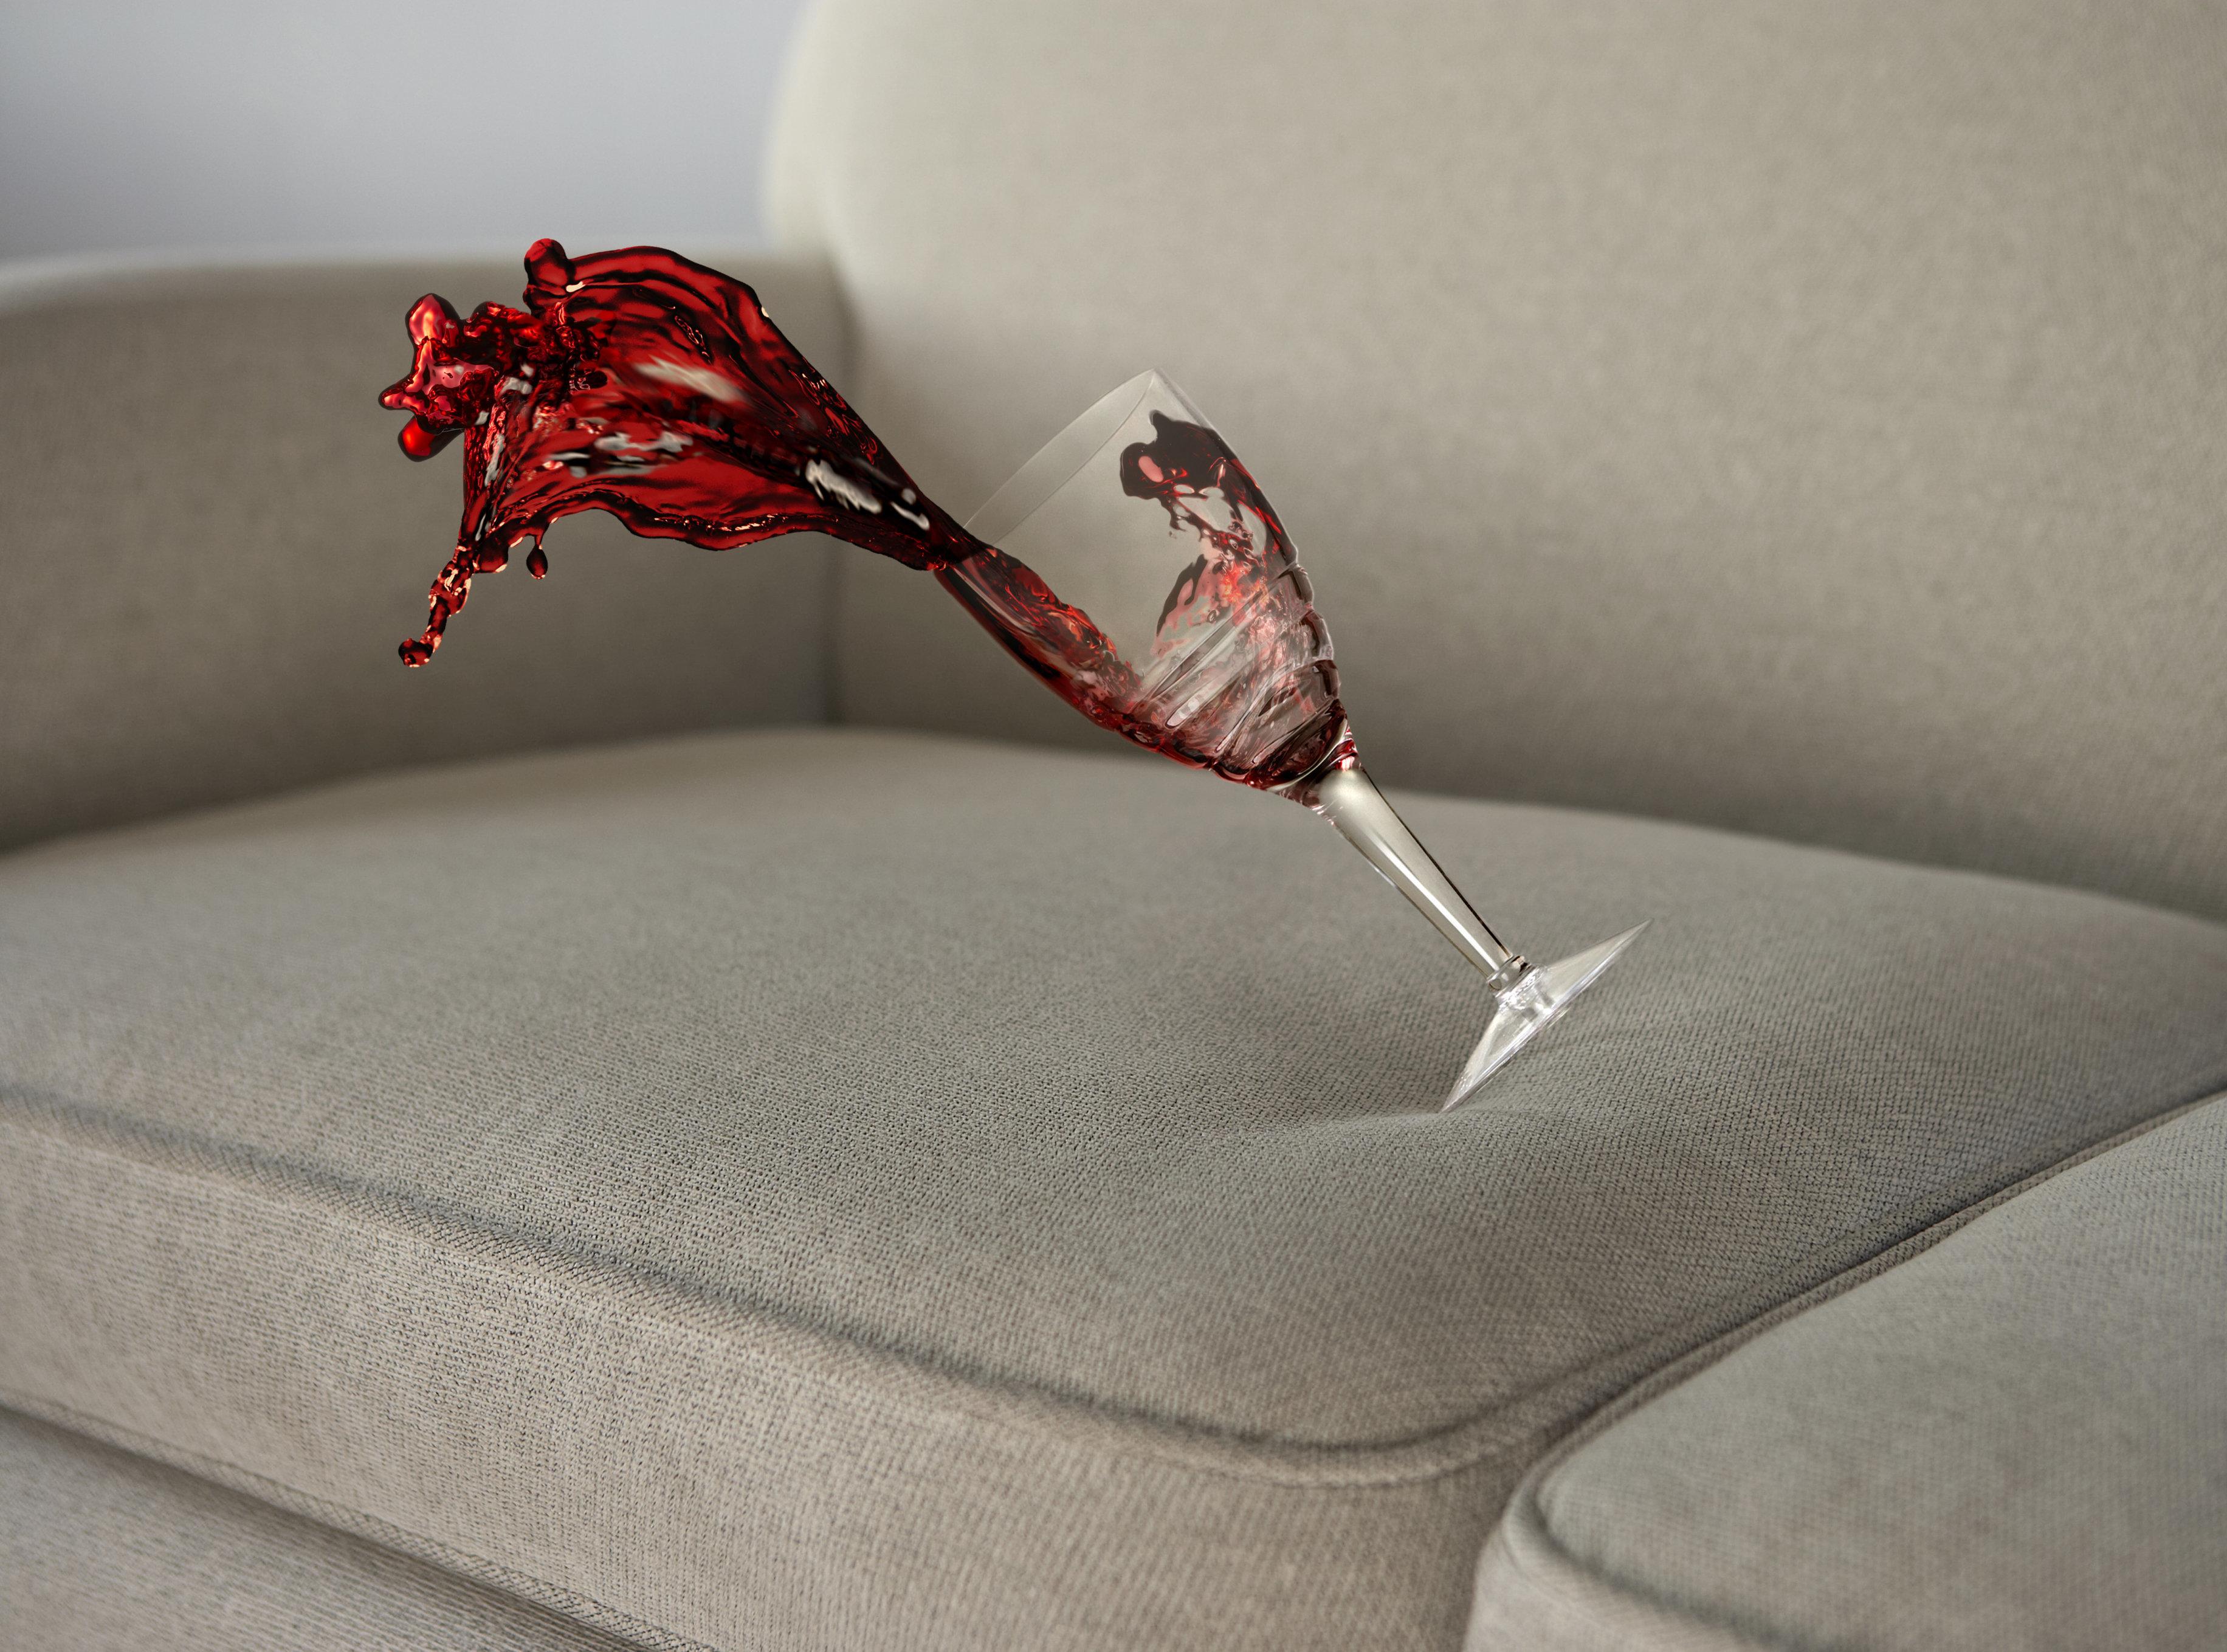 red wine splashing onto sofa